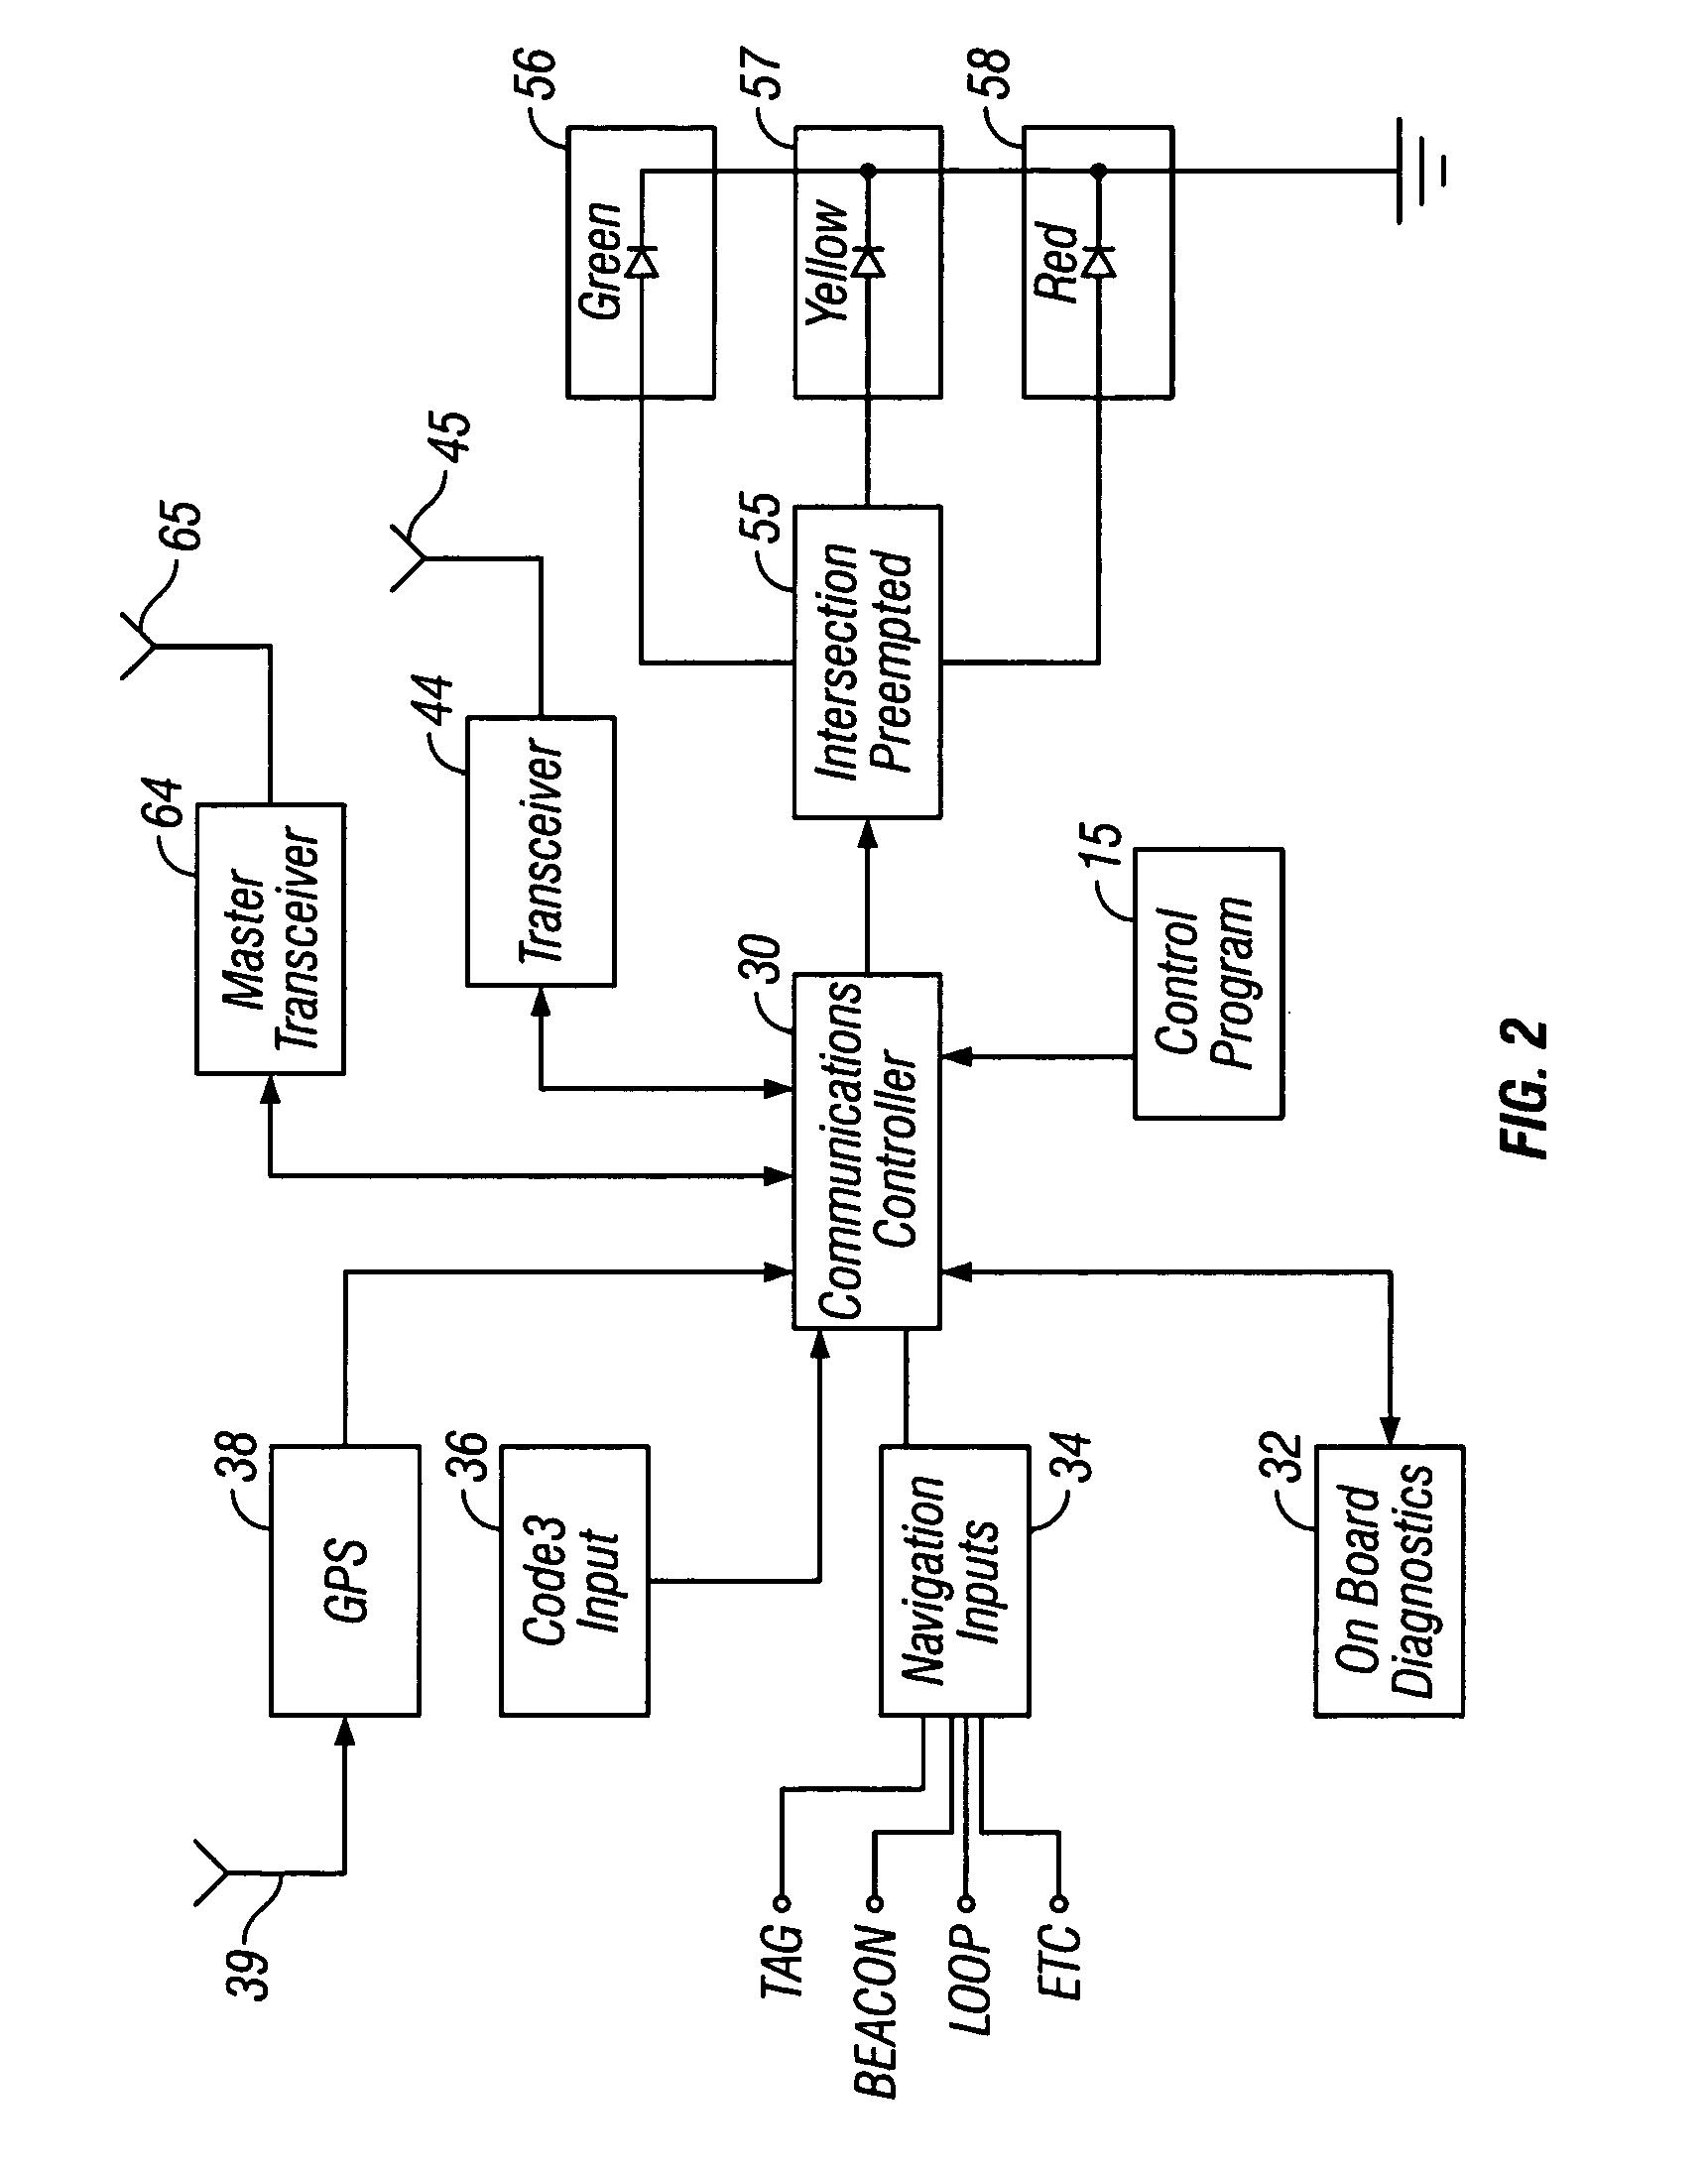 patent us6940422 - emergency vehicle traffic signal preemption system